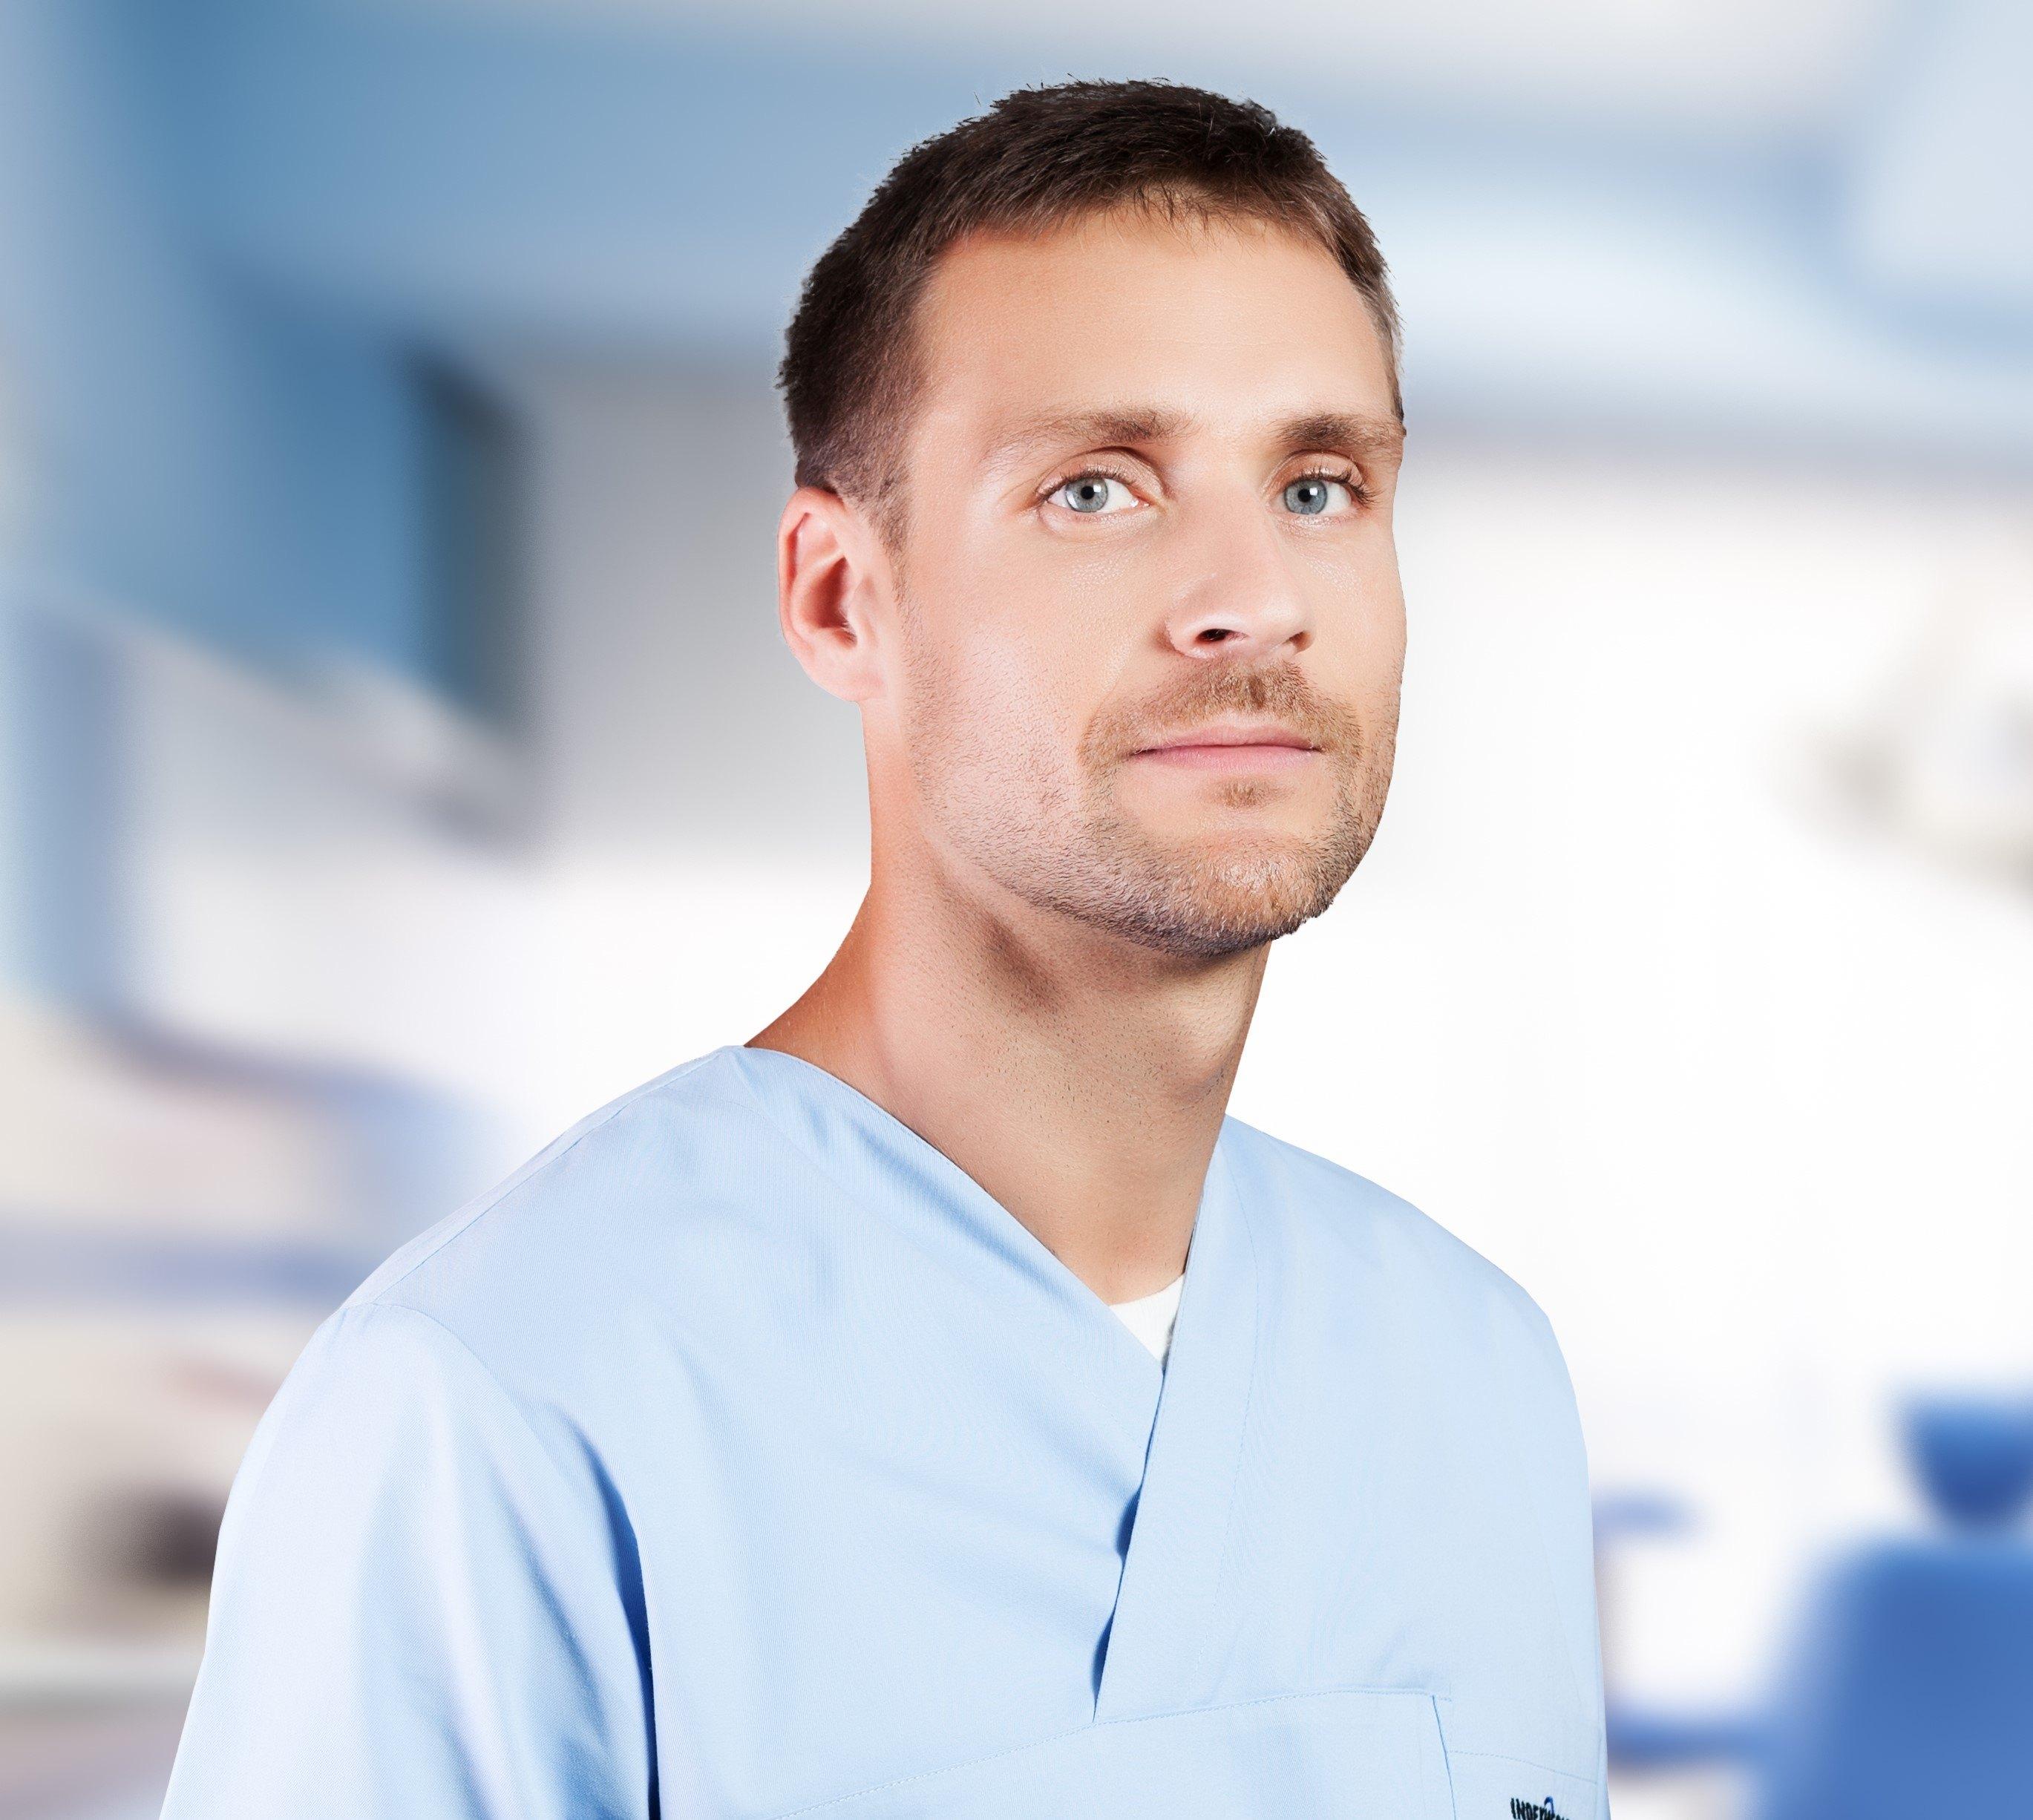 Daniel Uryga Dentist